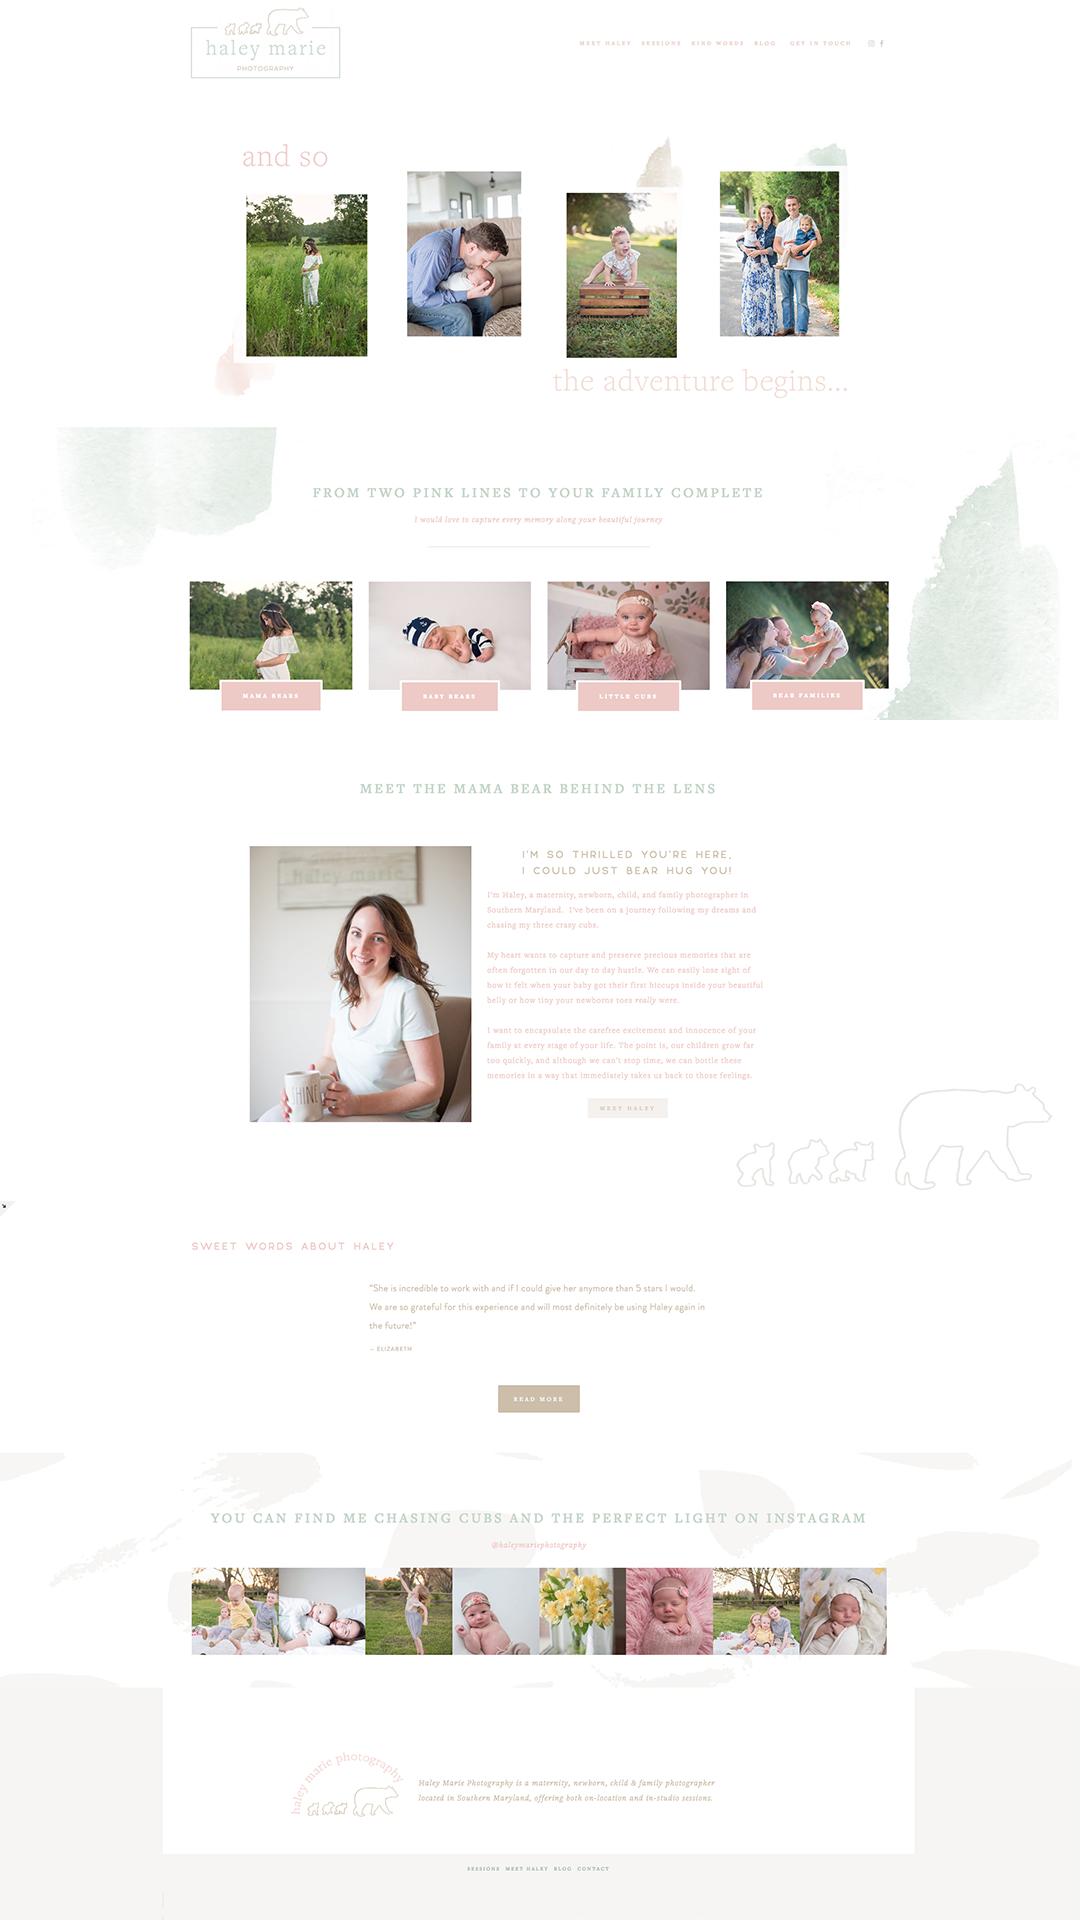 haley_homepage_launch_instastories.png